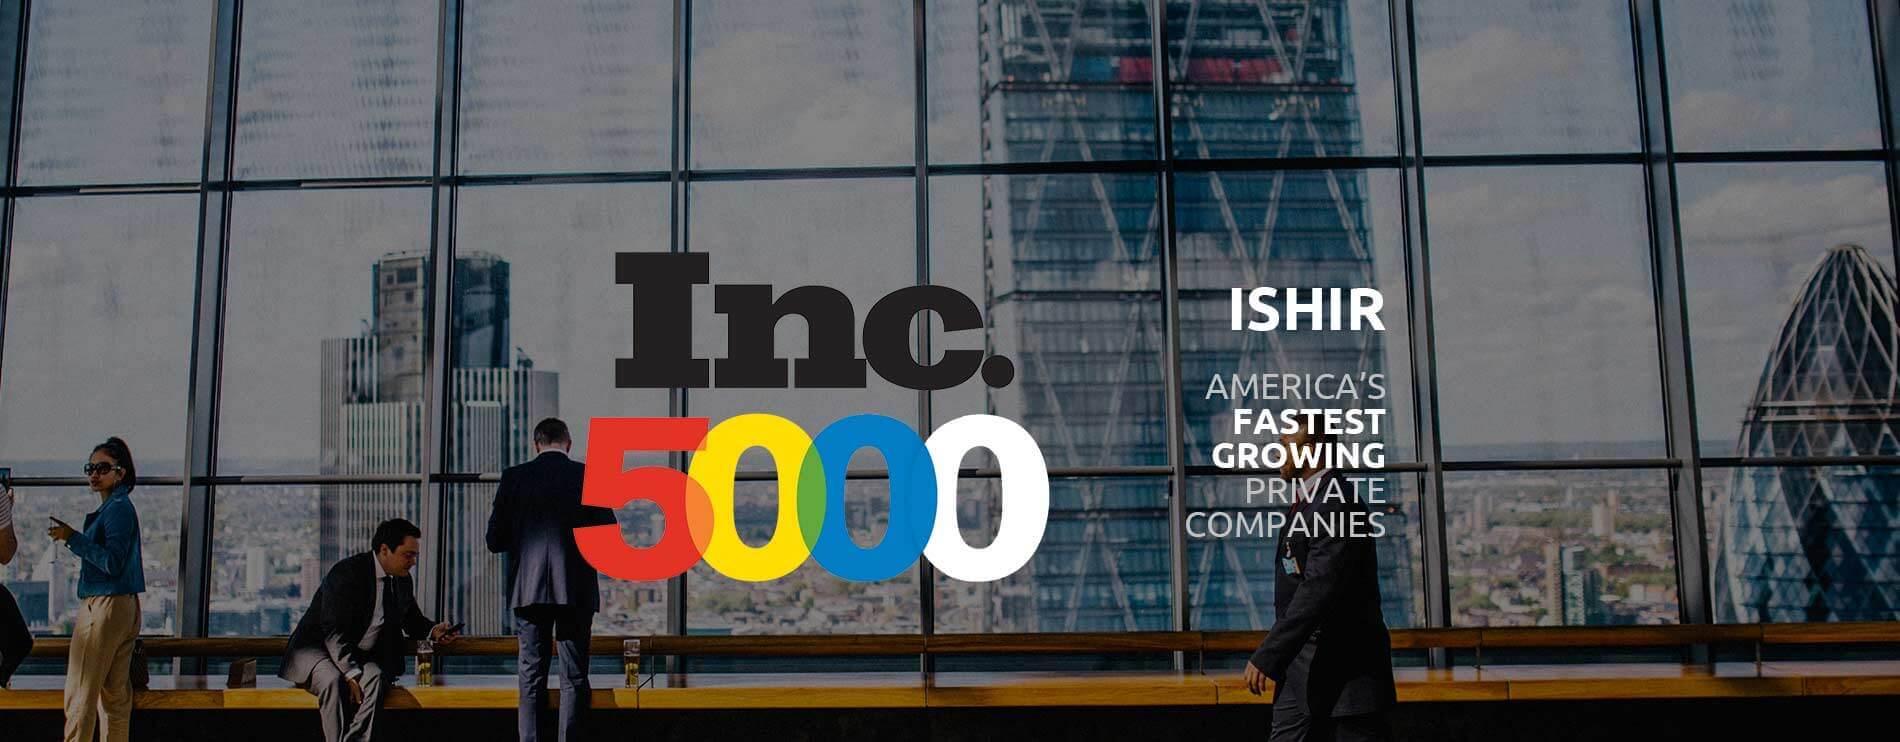 ISHIR - An Inc 5000 Company